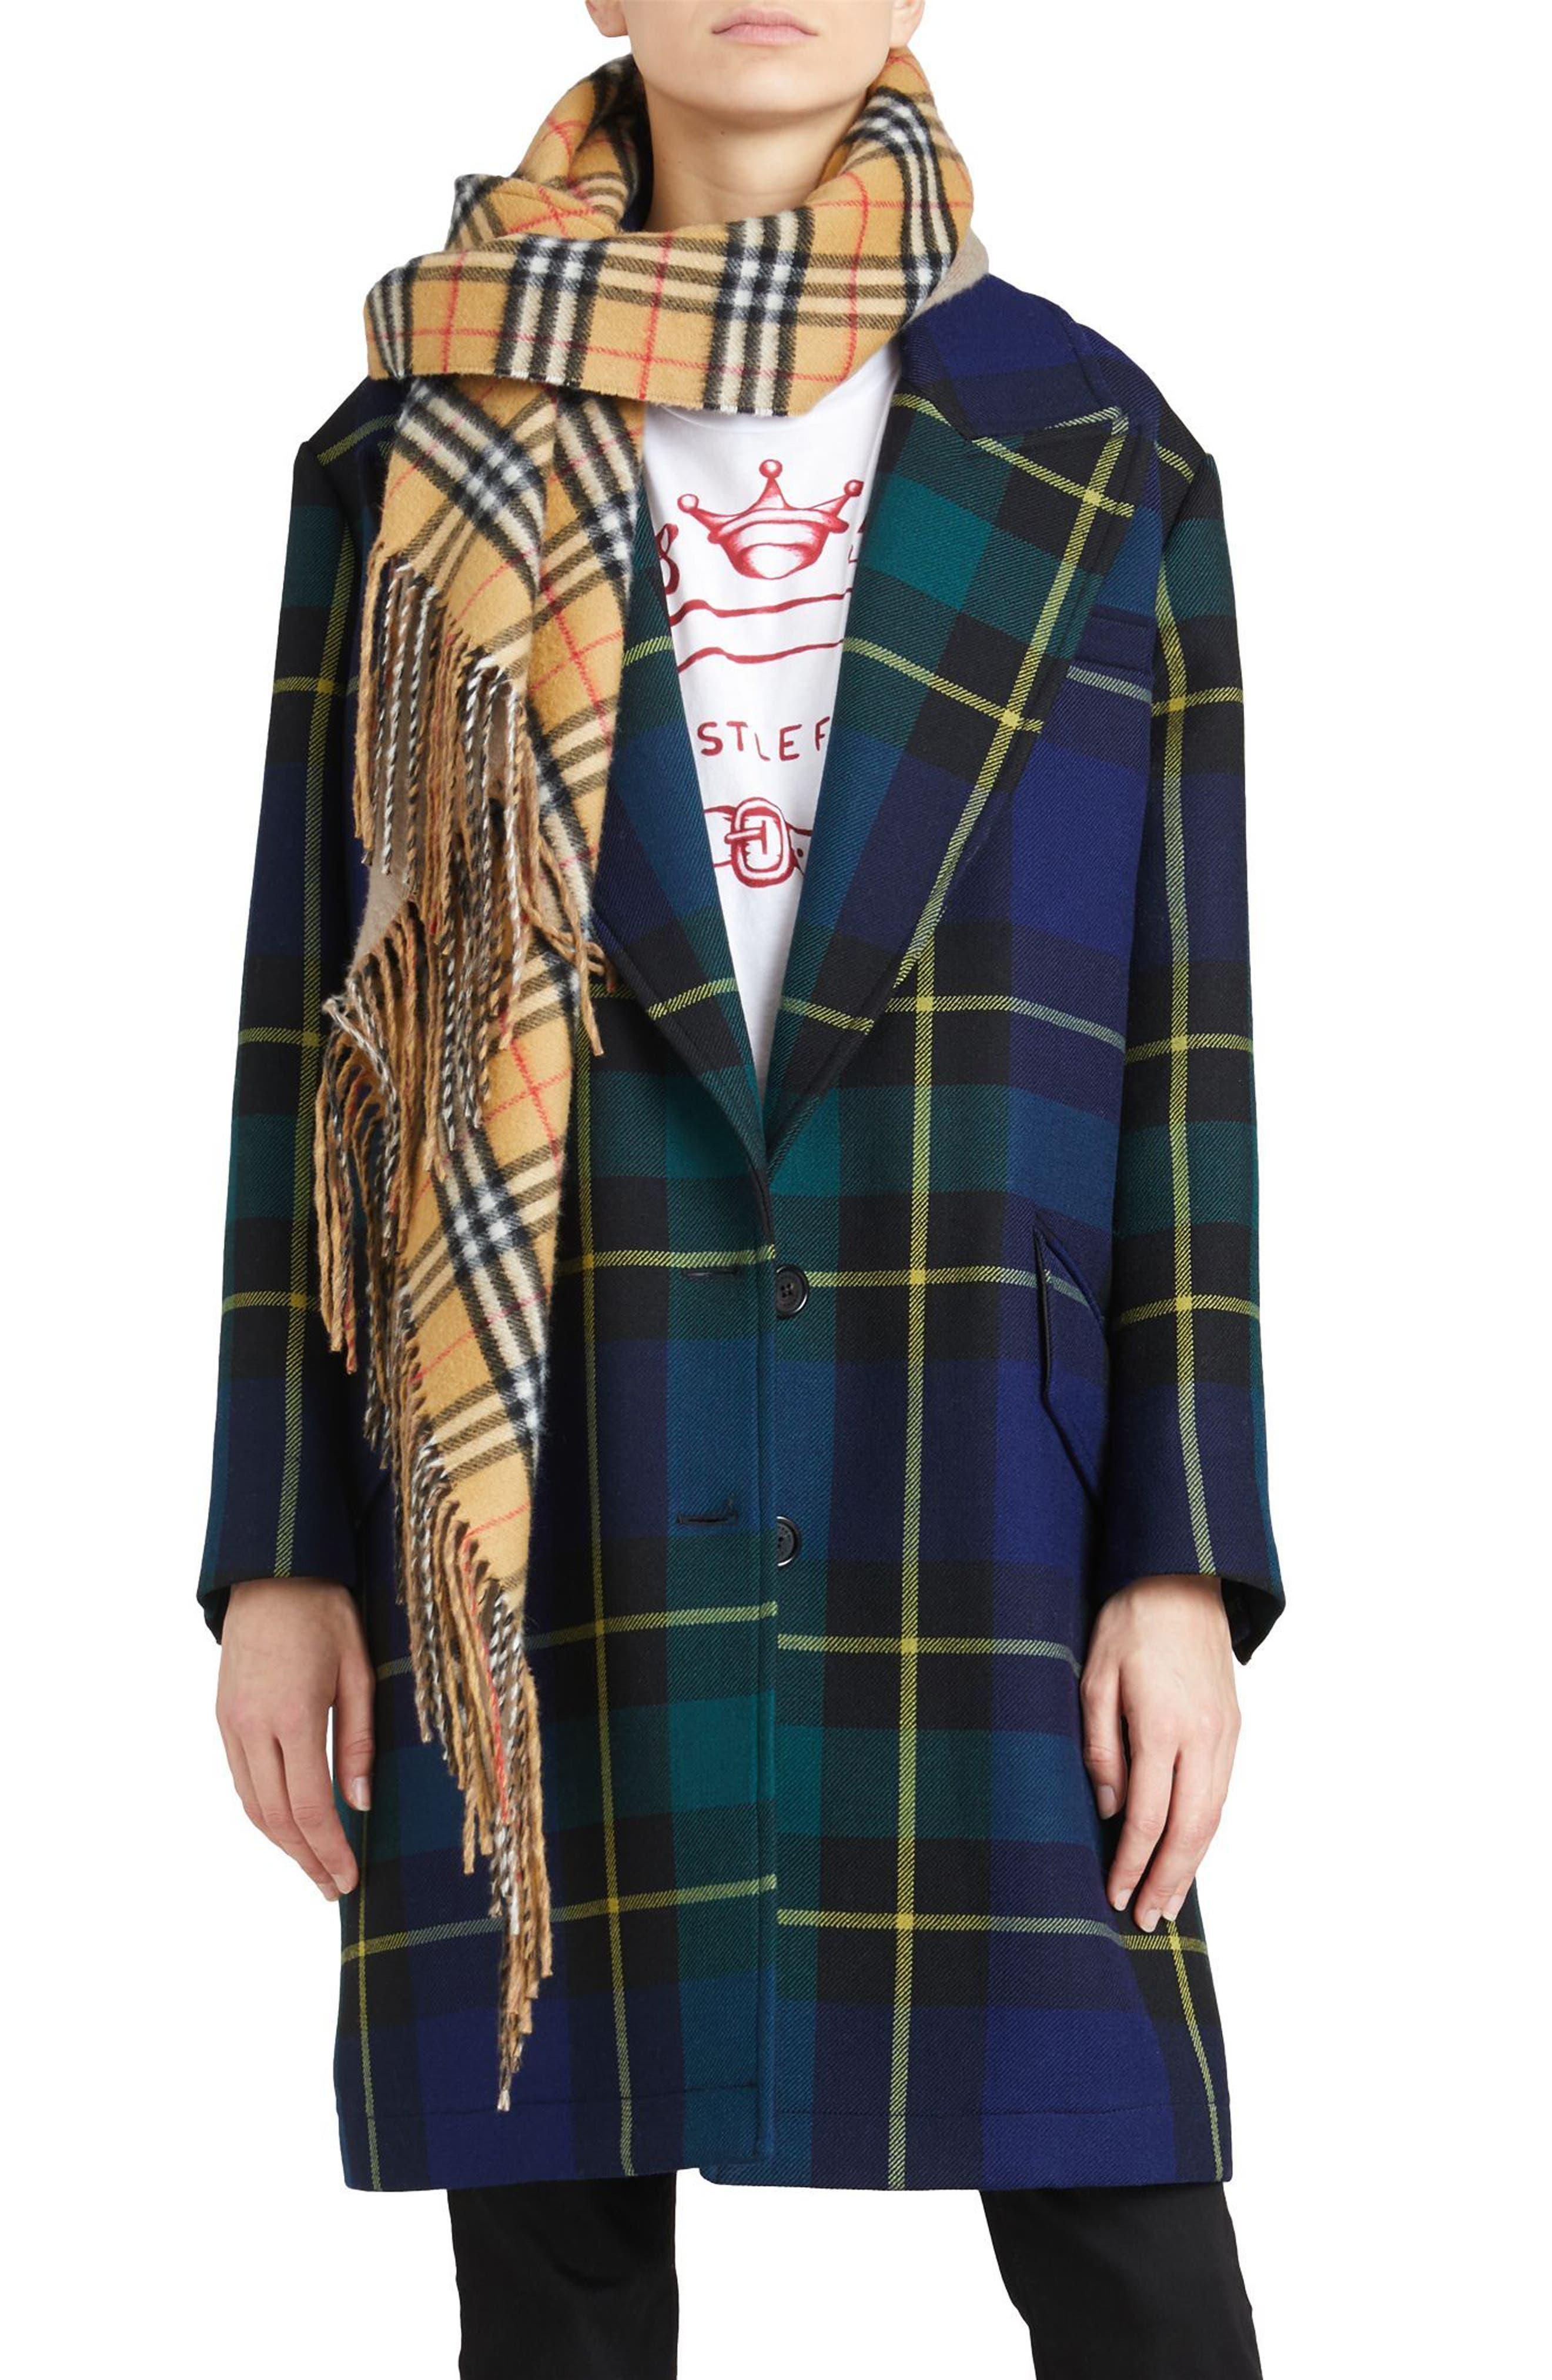 Alternate Image 1 Selected - Burberry Strathyre Tartan Plaid Wool Blend Coat